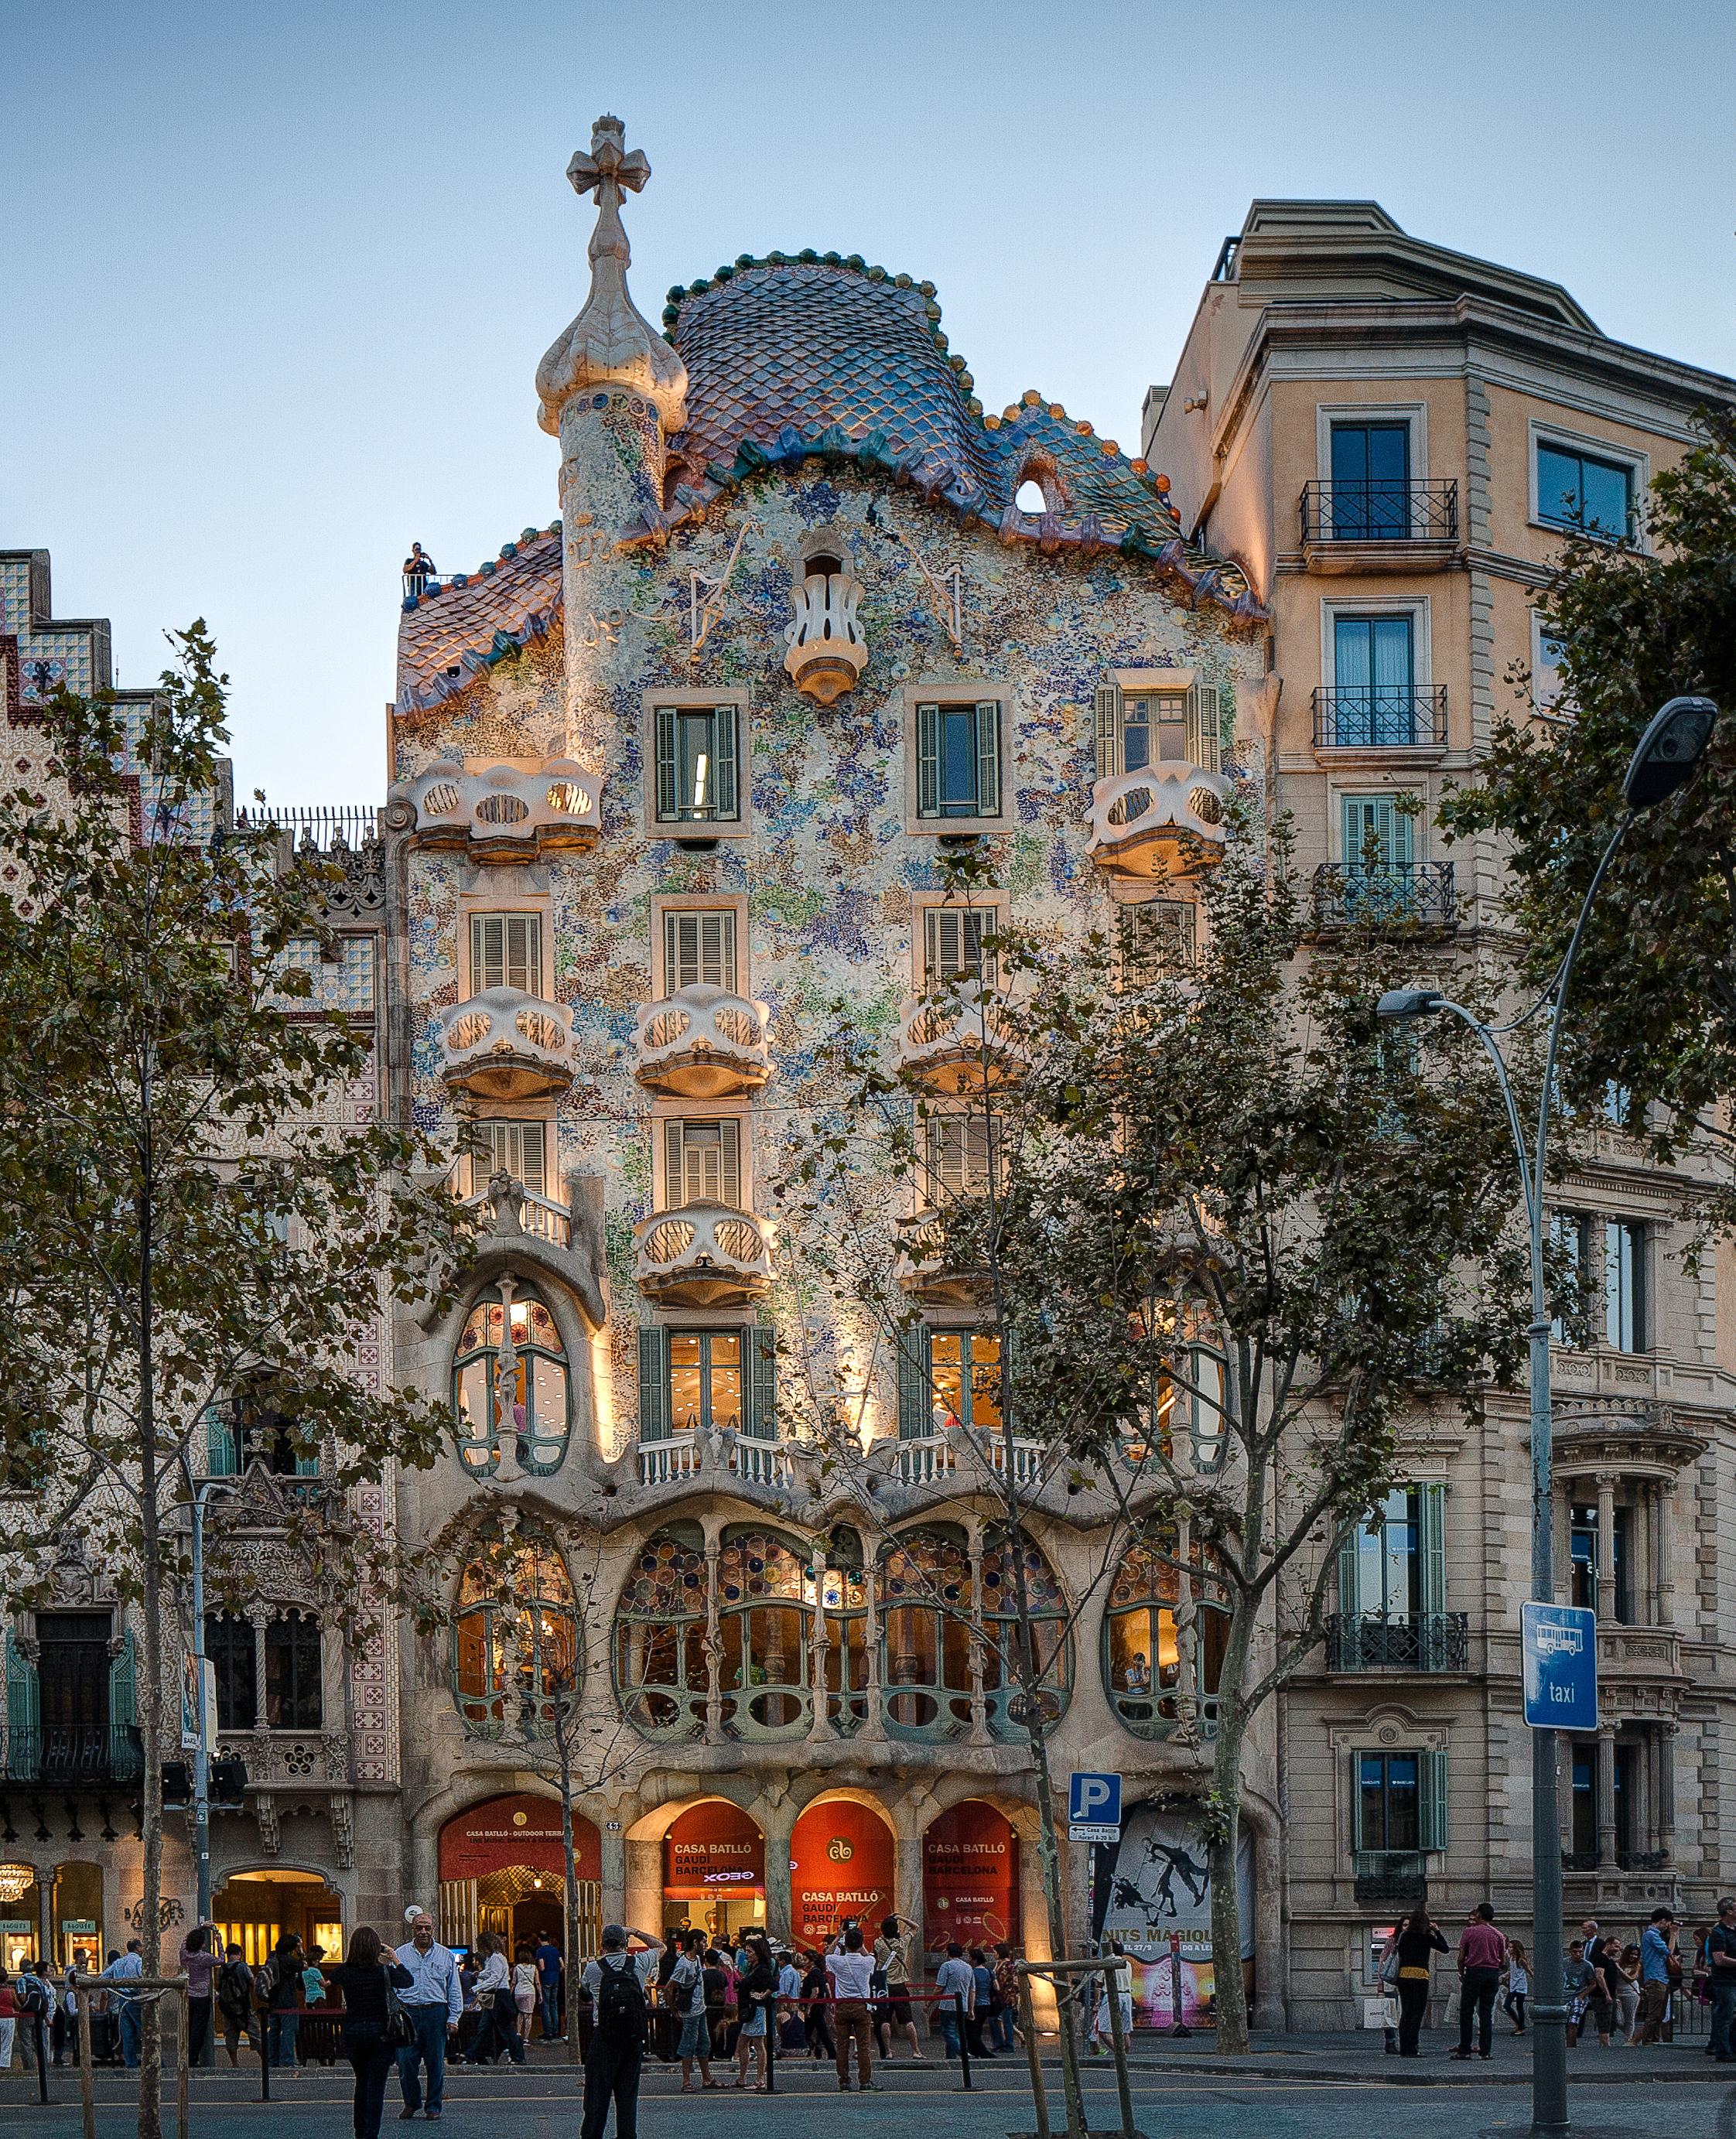 File:Casa Batllo Overview Barcelona Spain cut.jpg - Wikimedia Commons